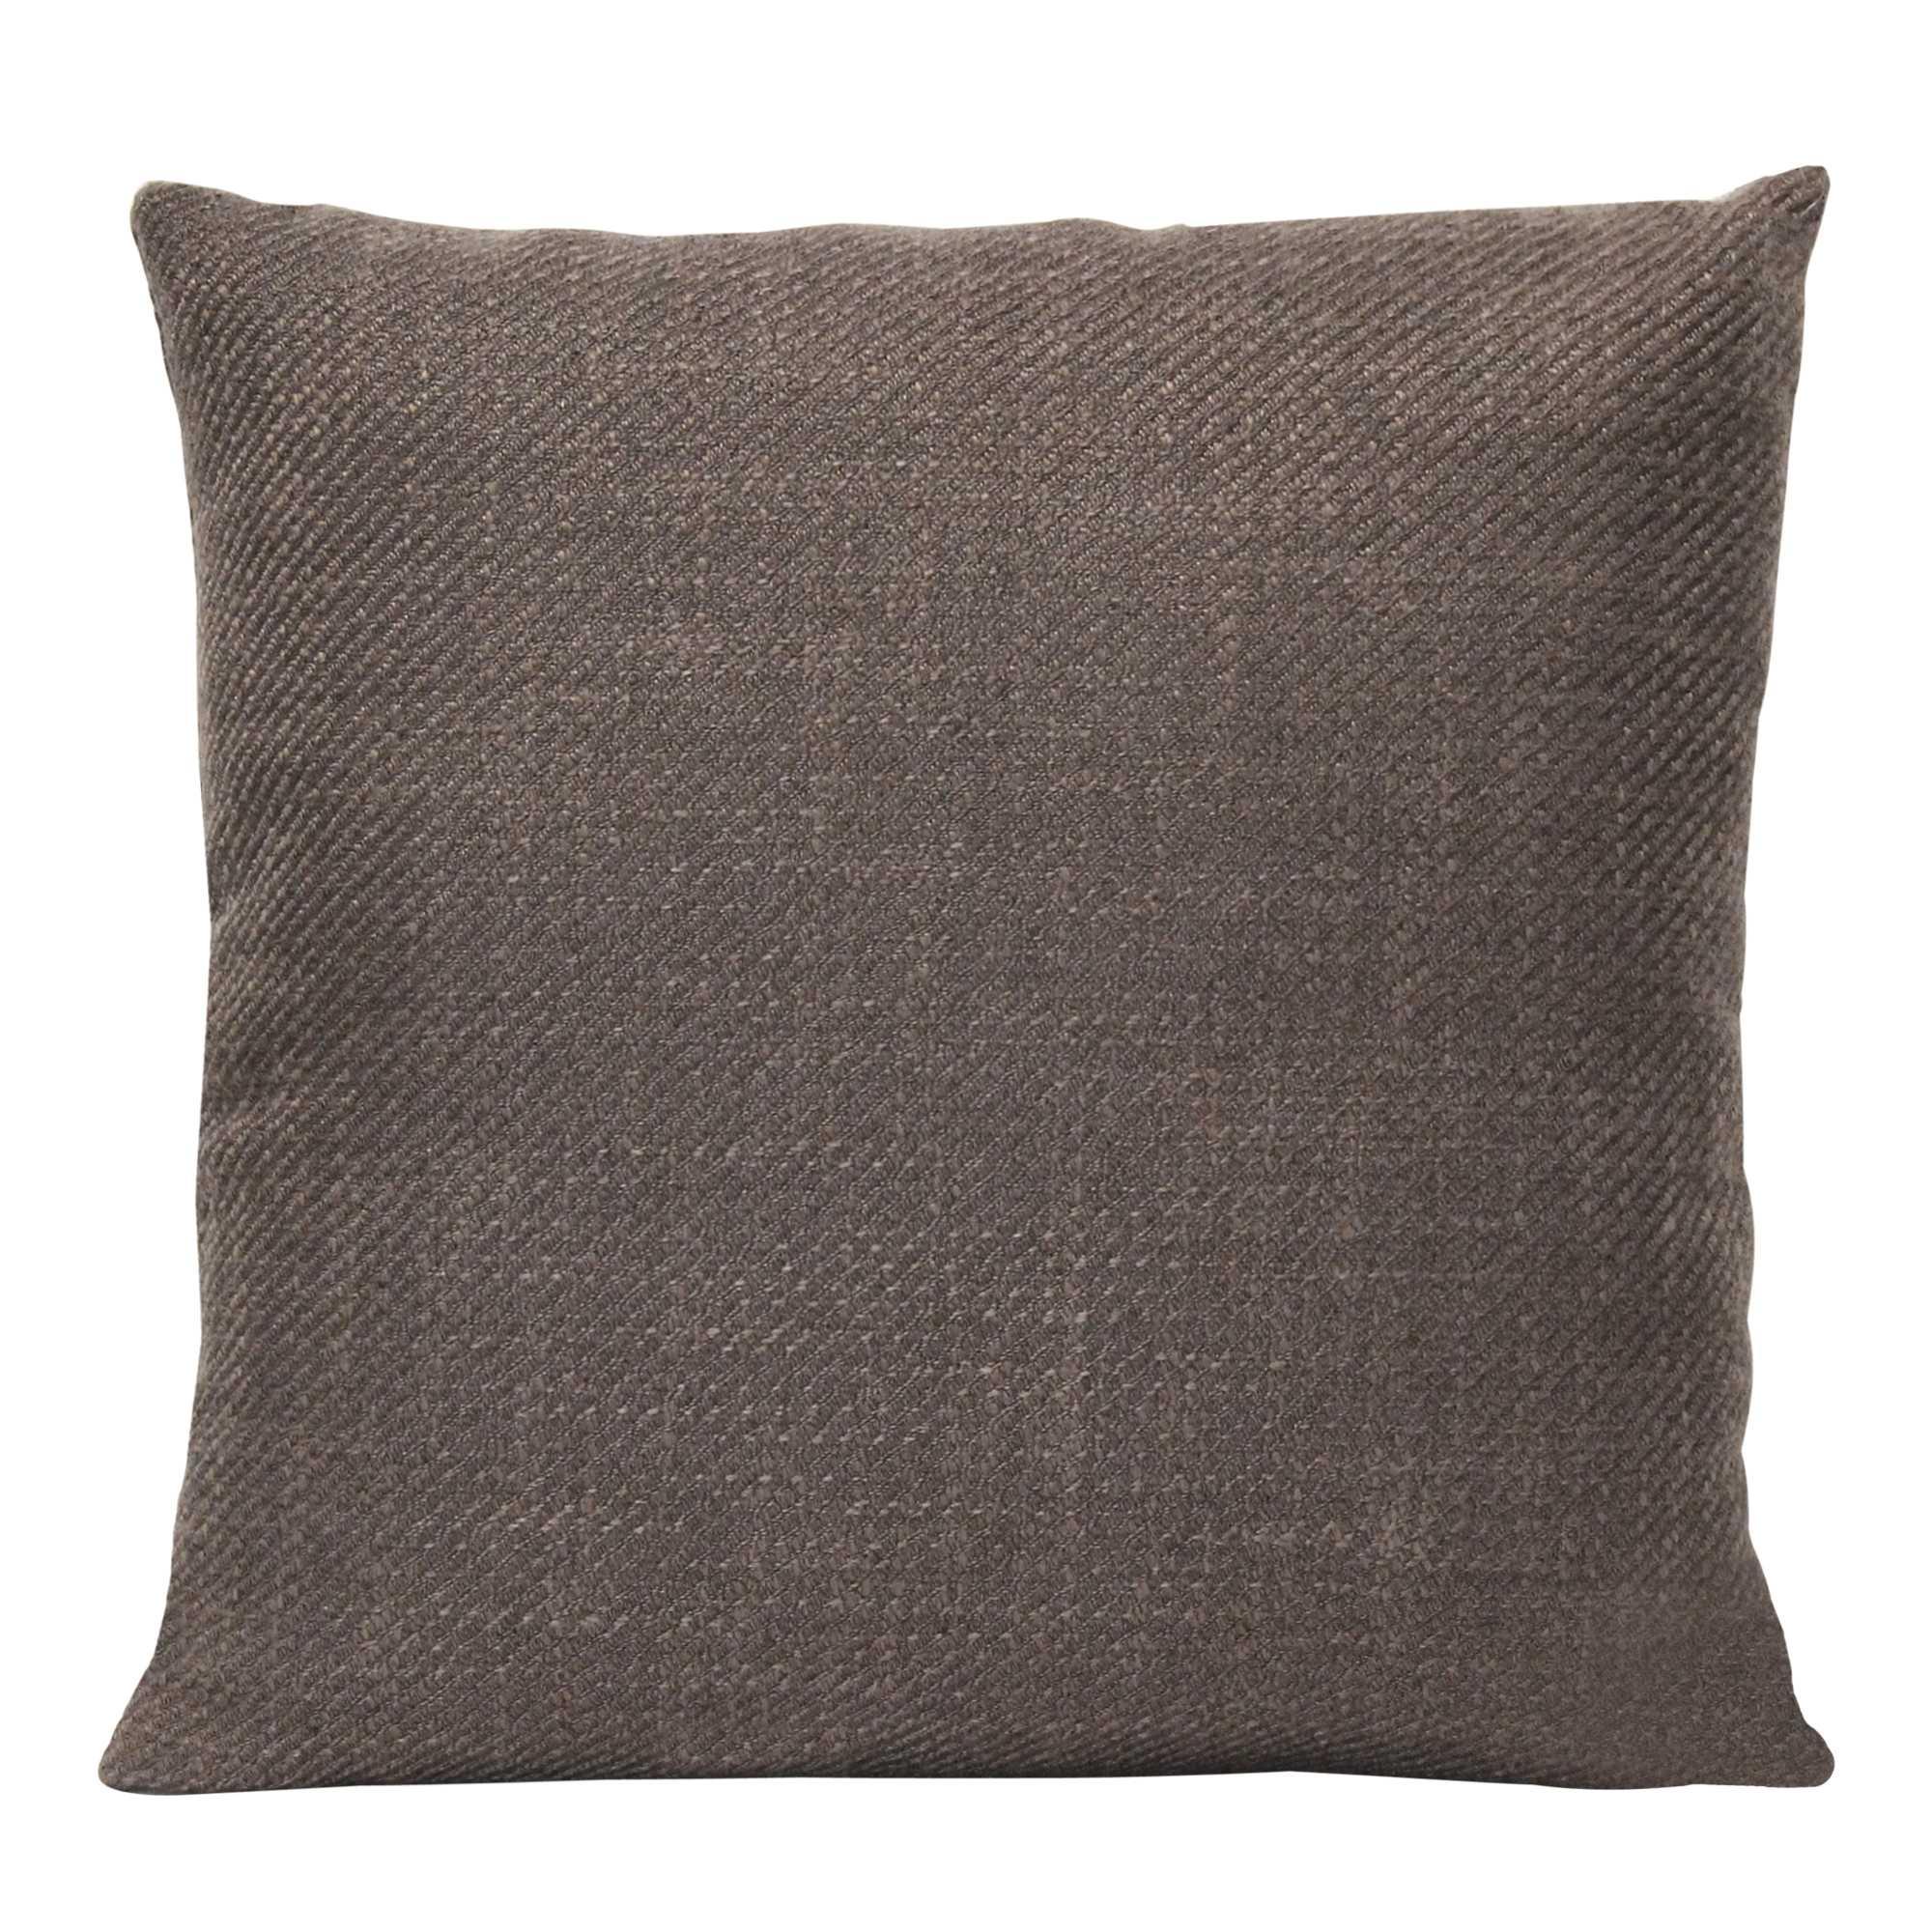 Mocha Brown Tweed Textured Velvet Square Pillow